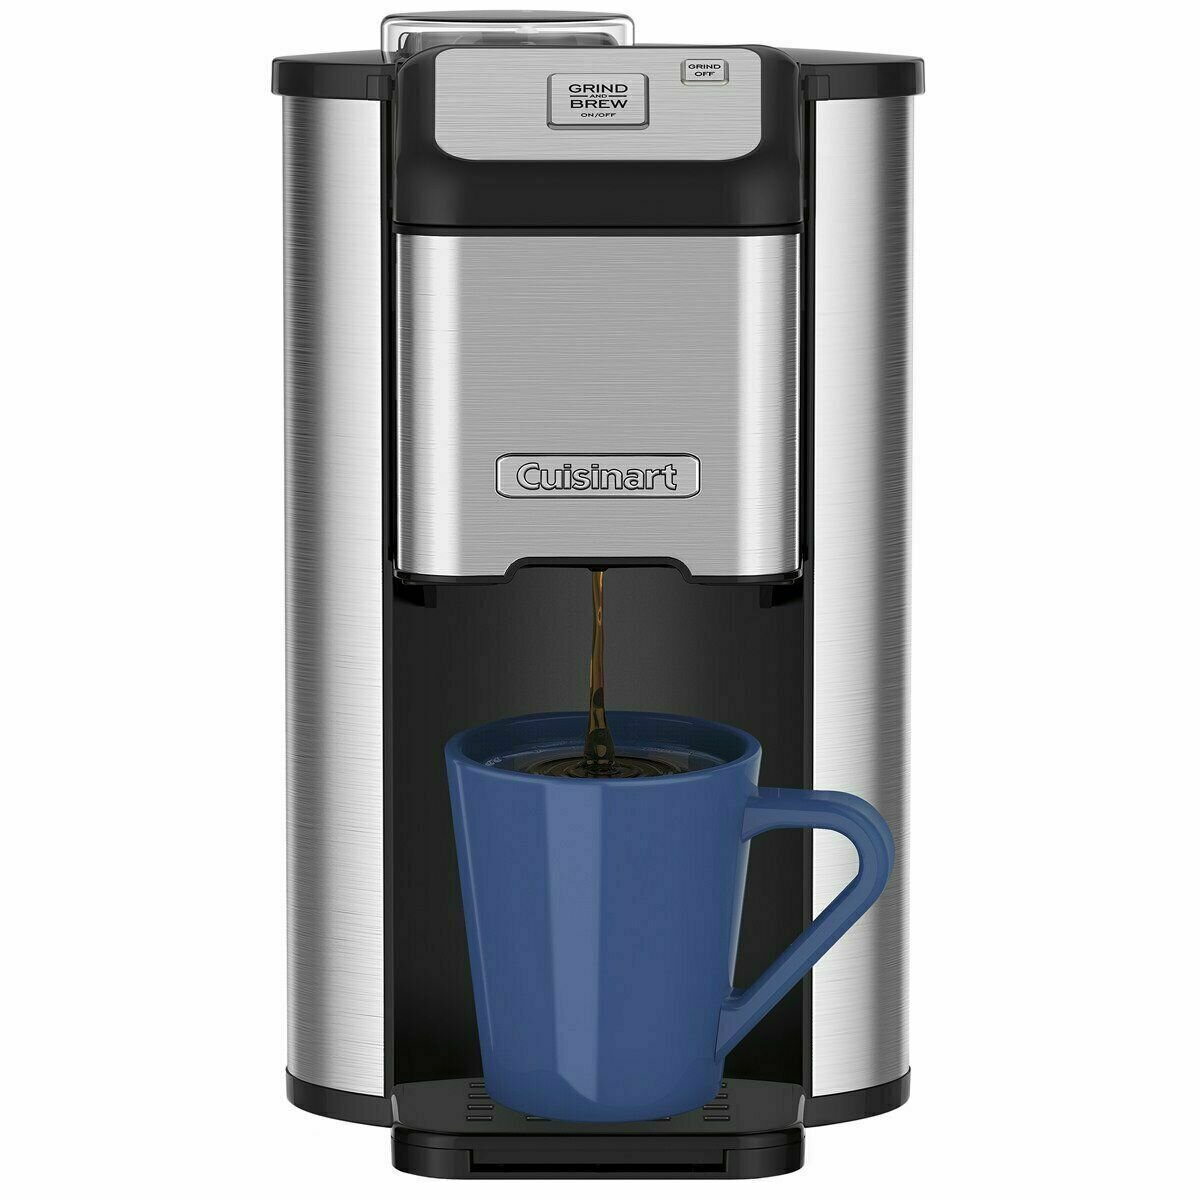 Cuisinart Single Cup Grind & Brew Coffee Maker   Reg Price: $90   Today's Price: $46 (48%)    via eBay